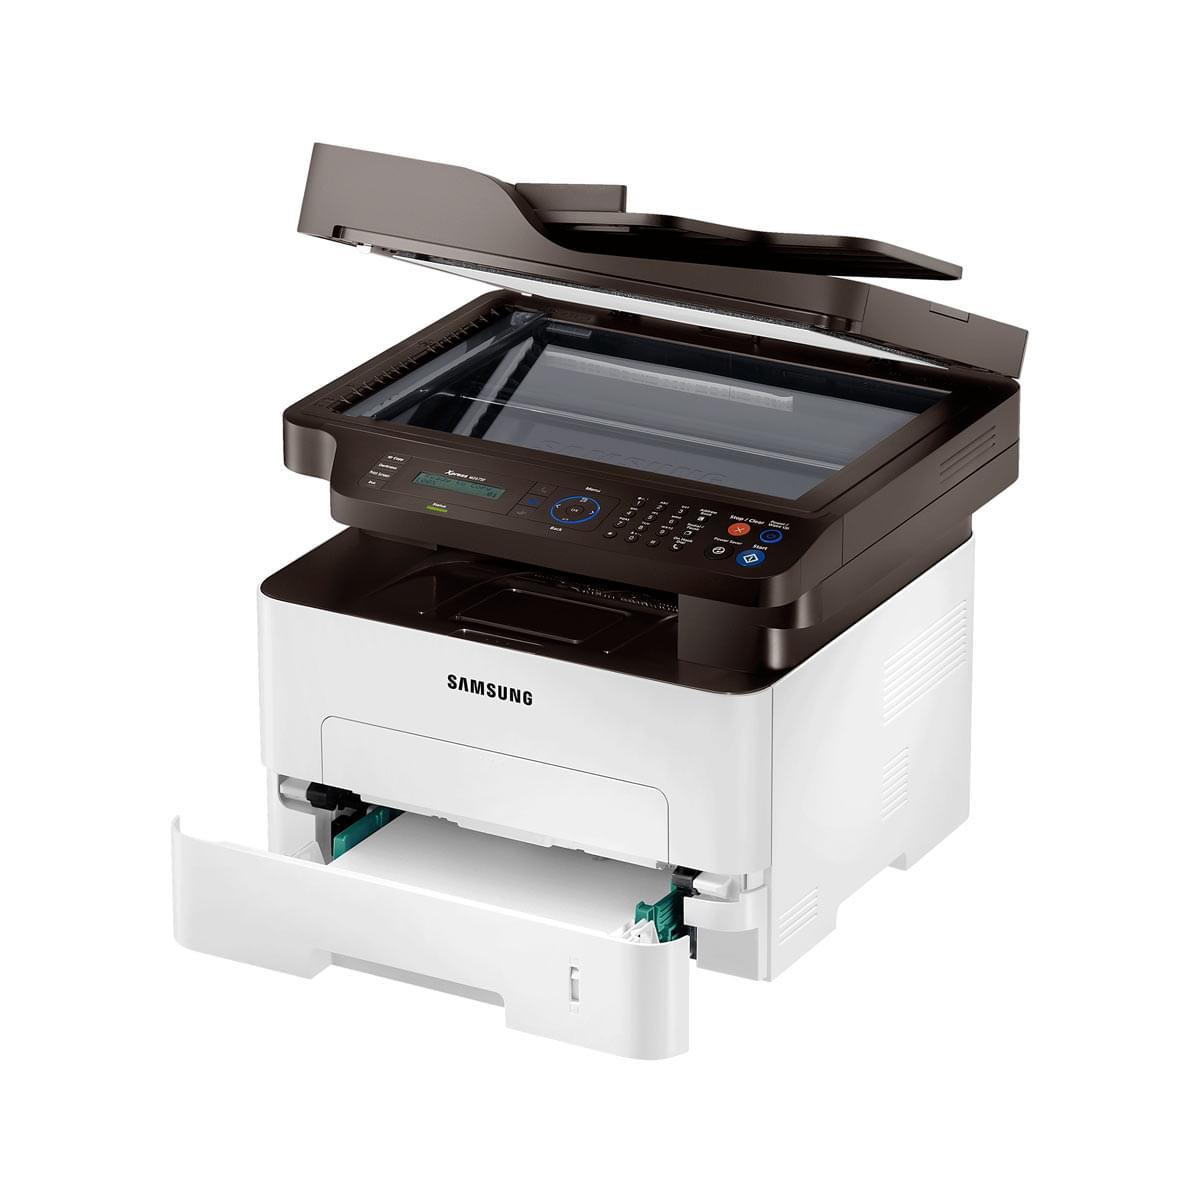 Imprimante multifonction Samsung SL-M2675FN - Cybertek.fr - 2